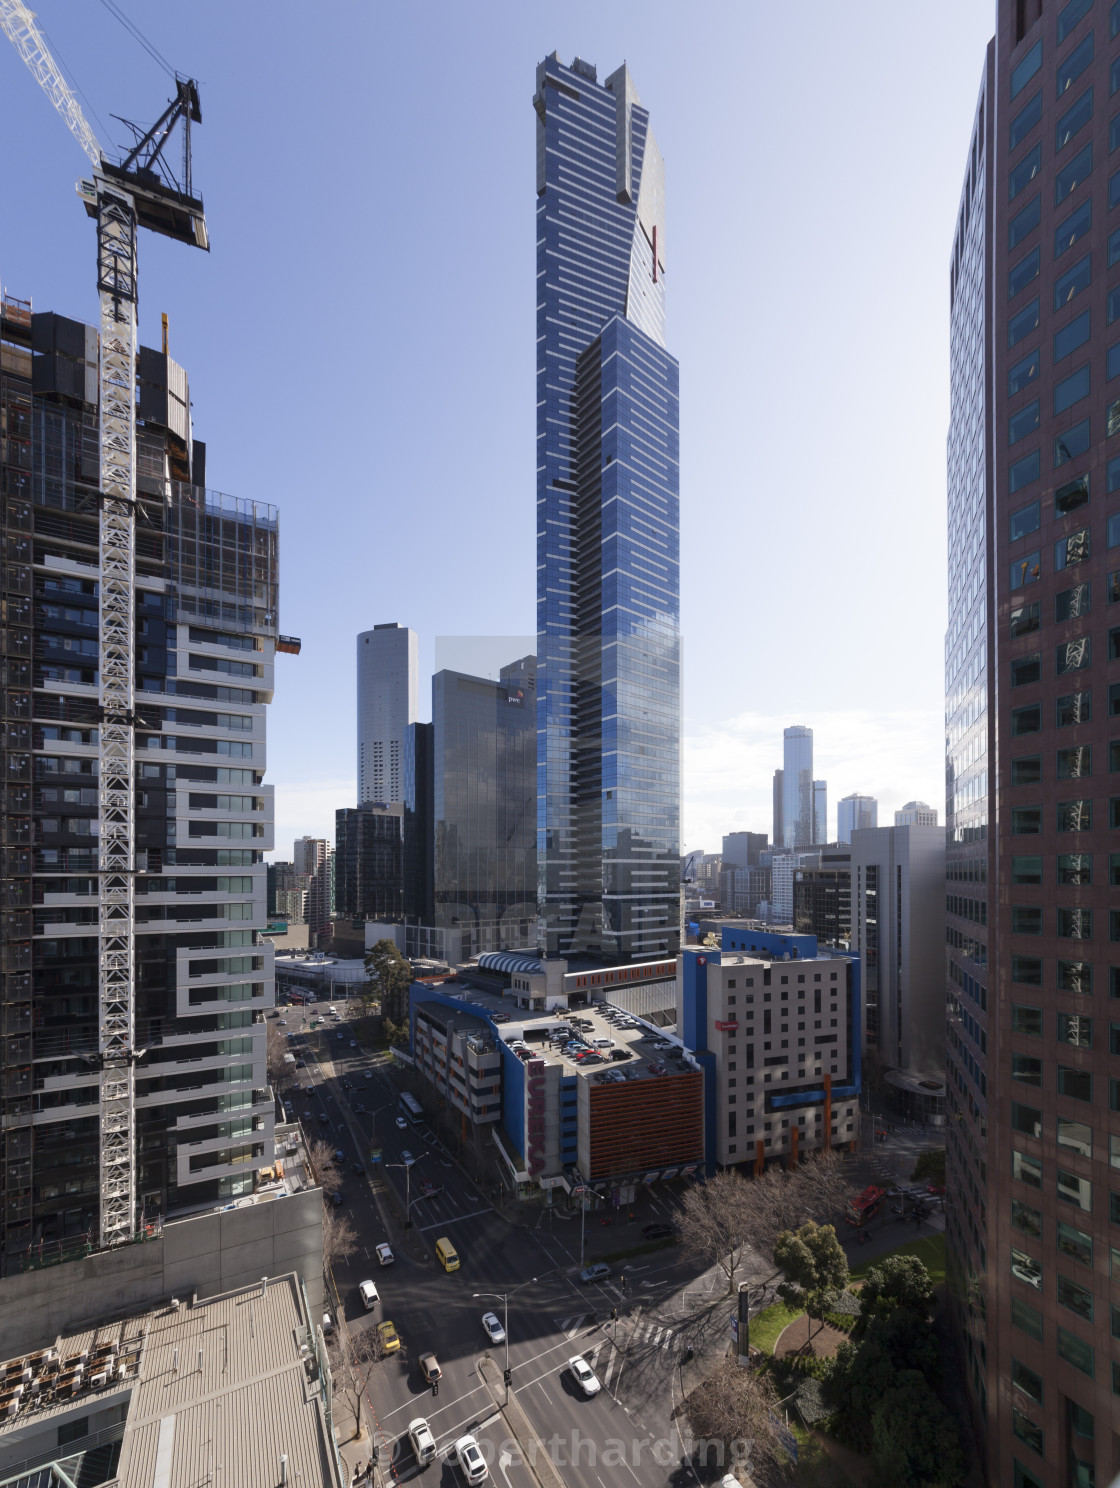 Eureka Tower (91 floors), Melbourne, Victoria, Australia